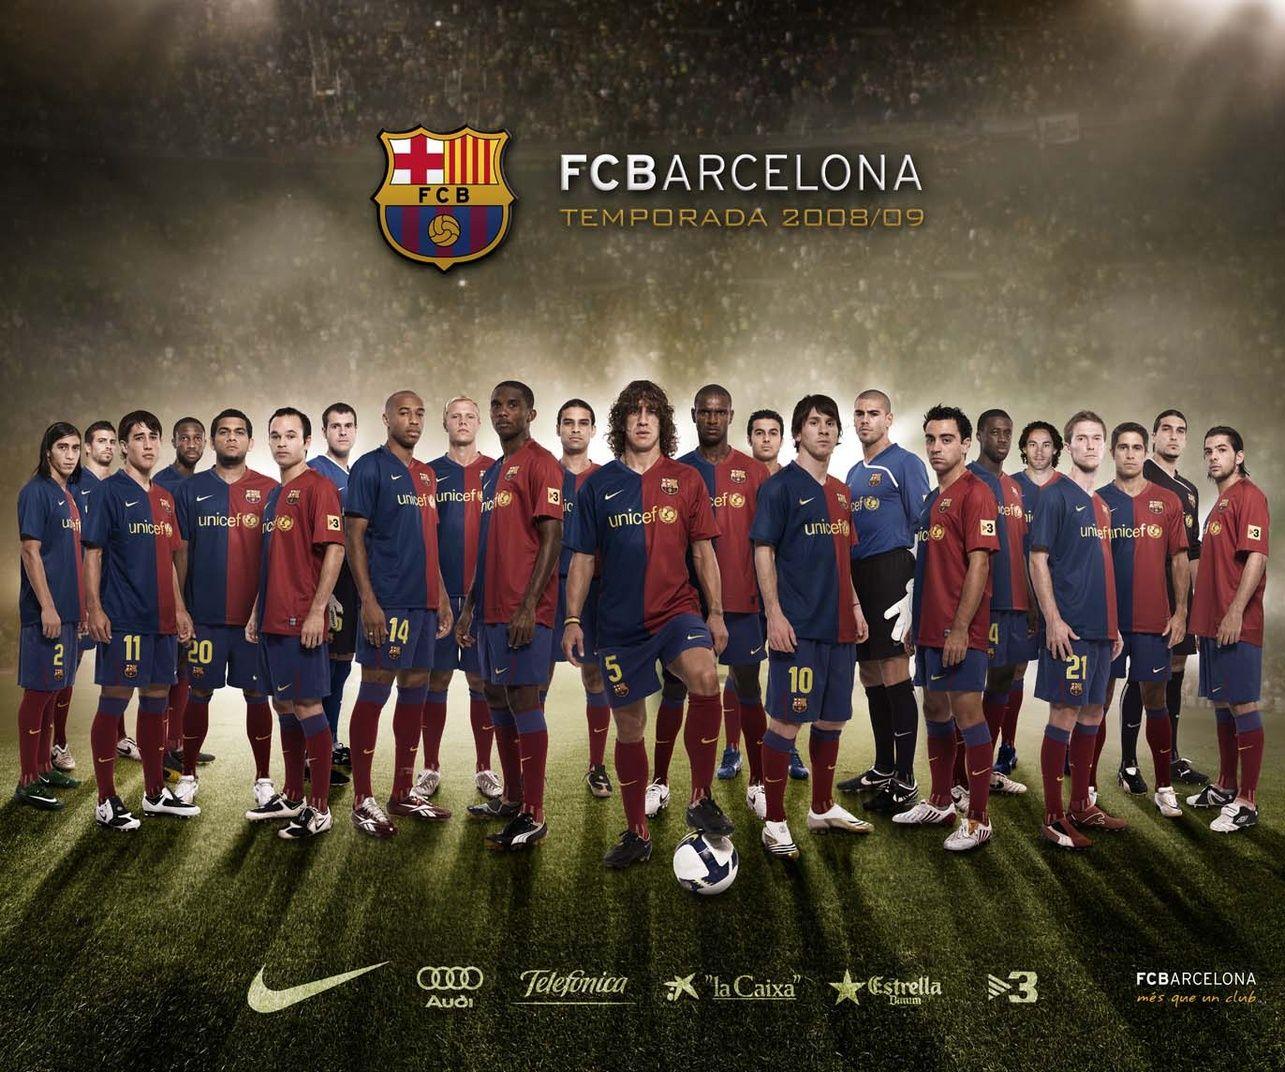 Football Soccer Wallpaper Barcelona Team Squad Photos And Http Www Wallpapersoccer Com Football Soccer W Barcelona Football Barcelona Team Barcelona Soccer